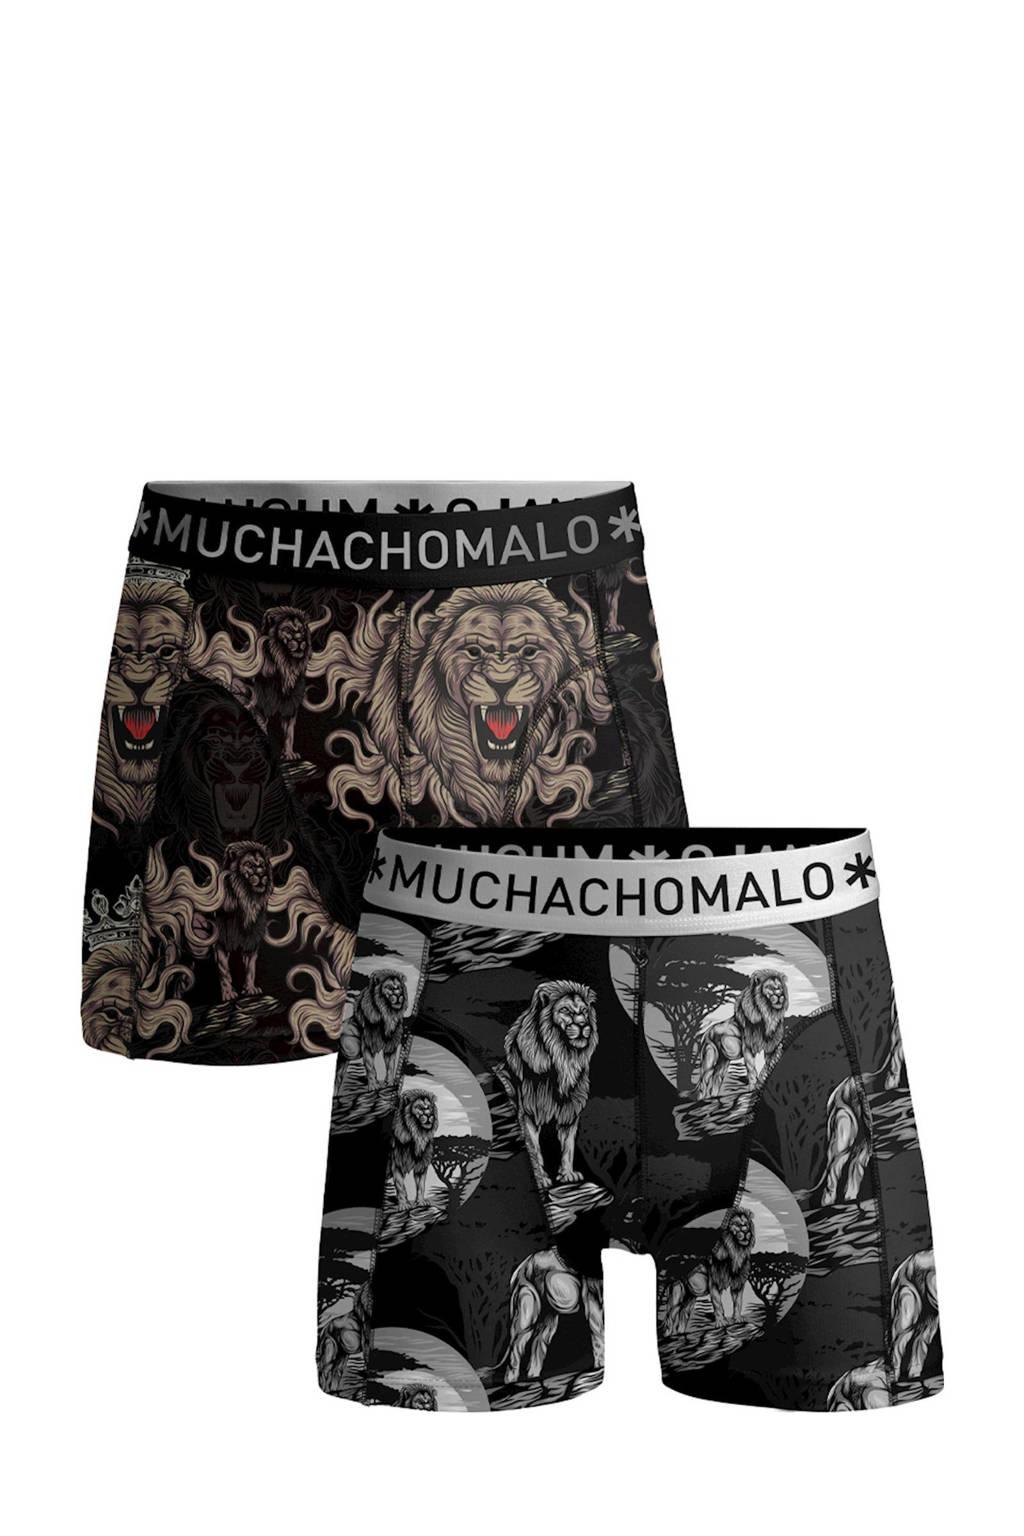 Muchachomalo   boxershort Lion King - set van 2, Zwart/grijs/bruin